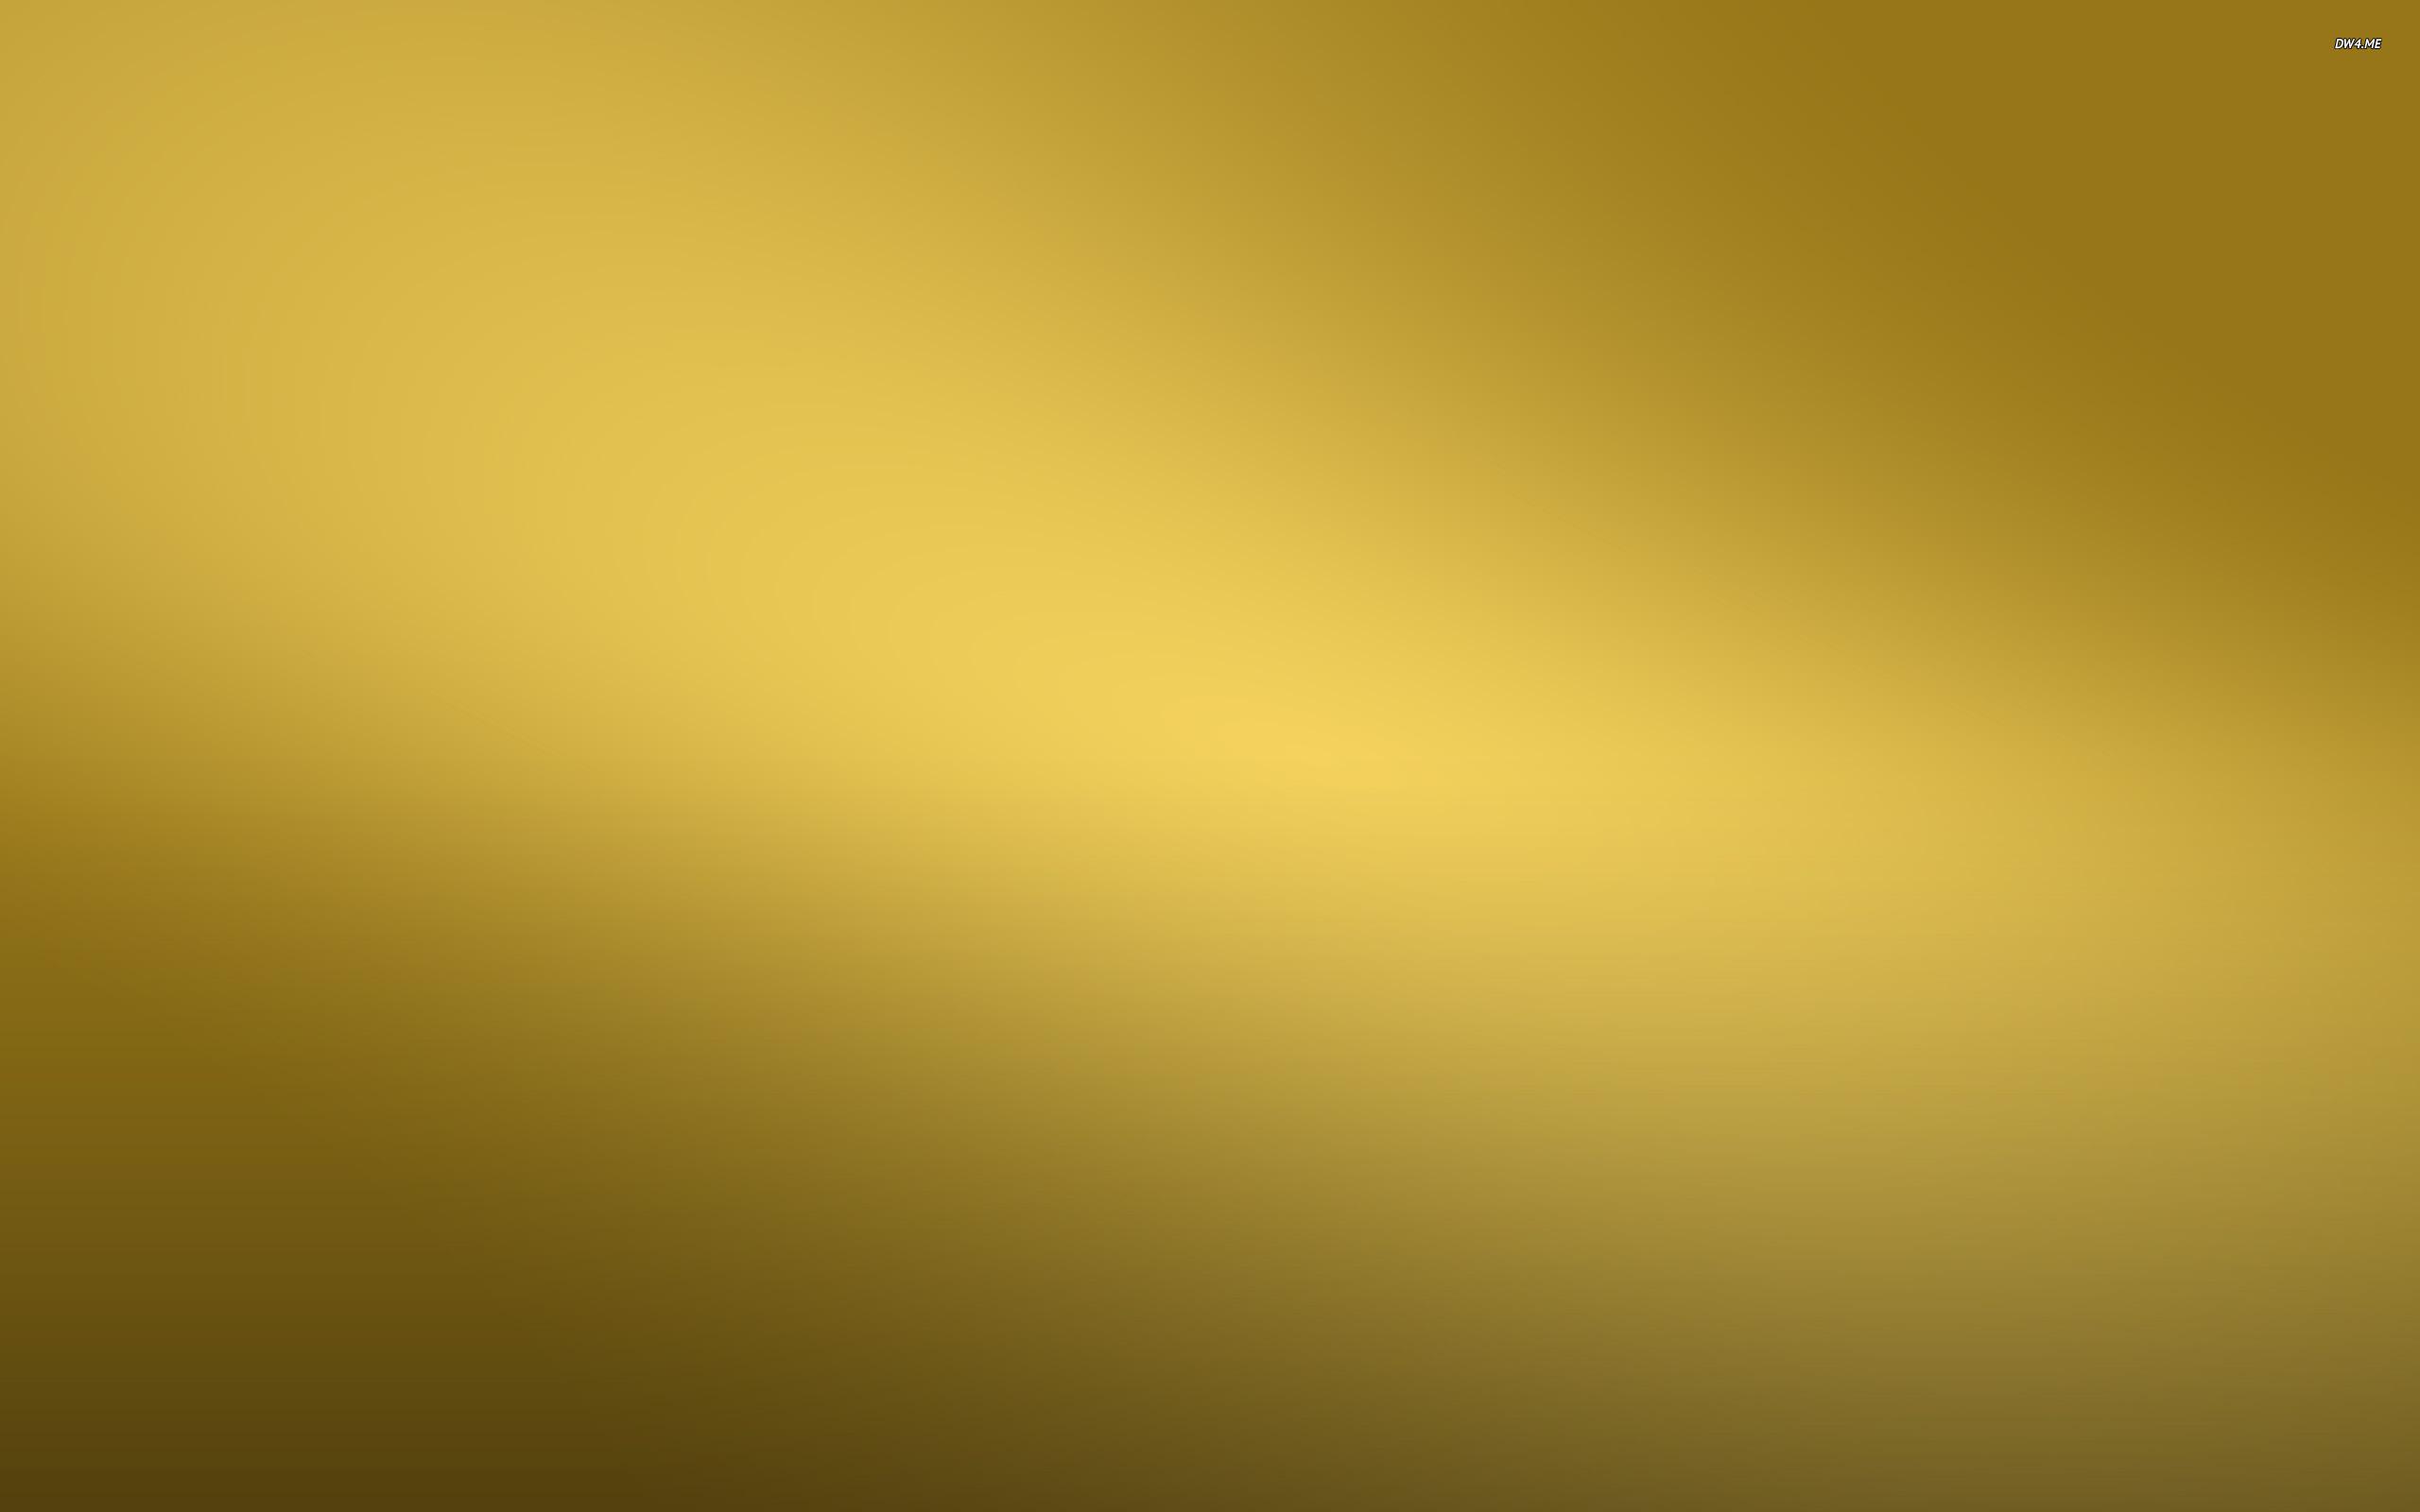 Gold wallpaper   Minimalistic wallpapers   389 2560x1600